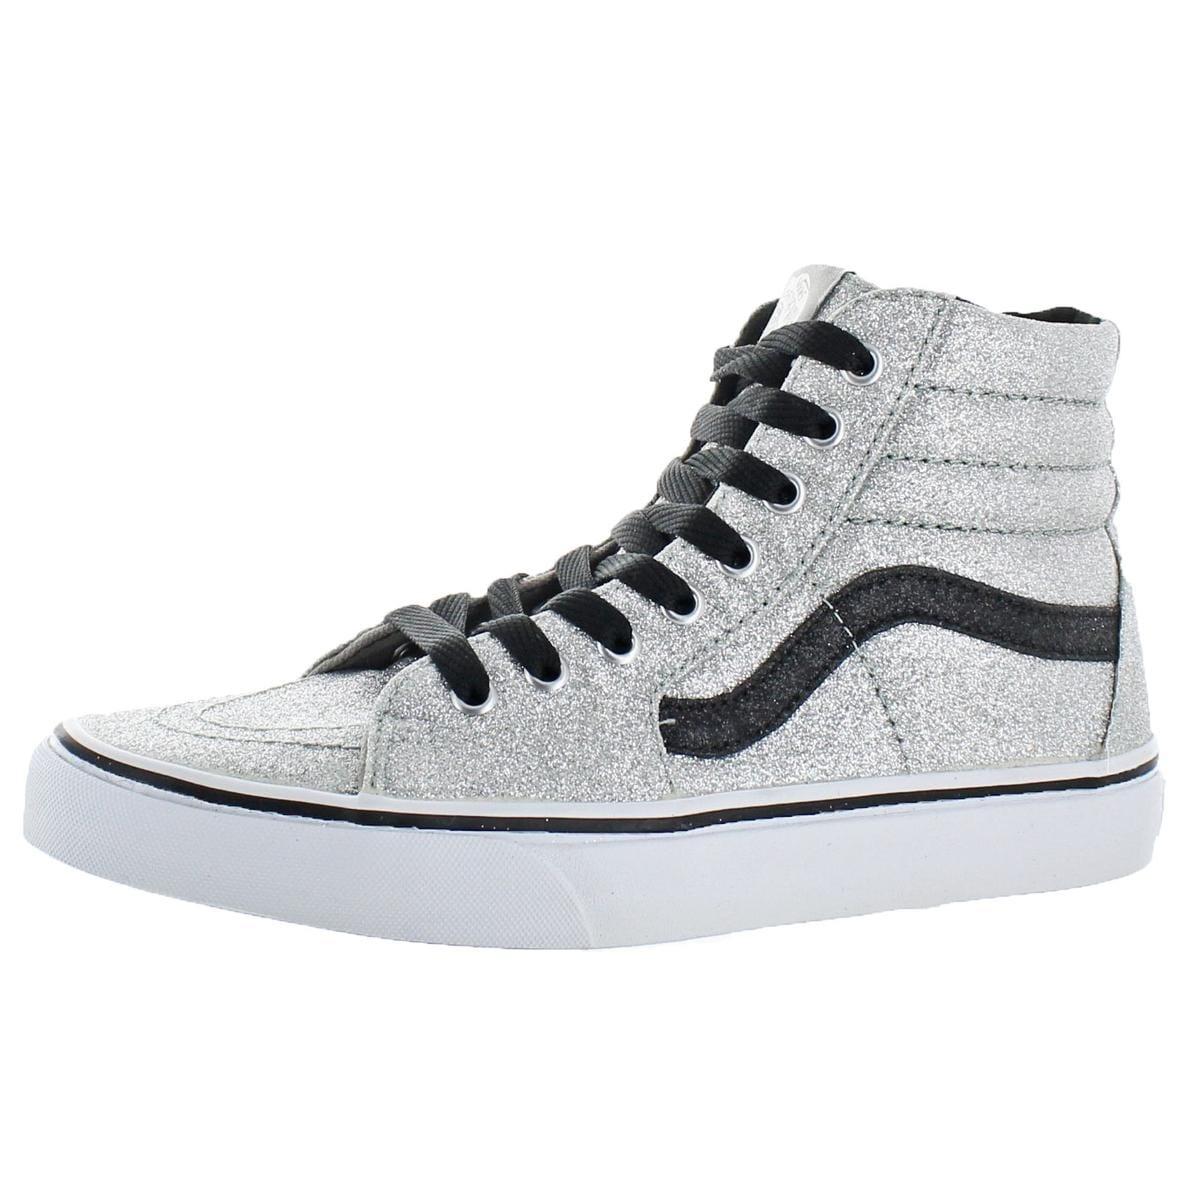 41c04bdf087b Shop Vans Womens Sk8-Hi(Glitter) Skate Shoes Fashion High Top - 9 medium  (b